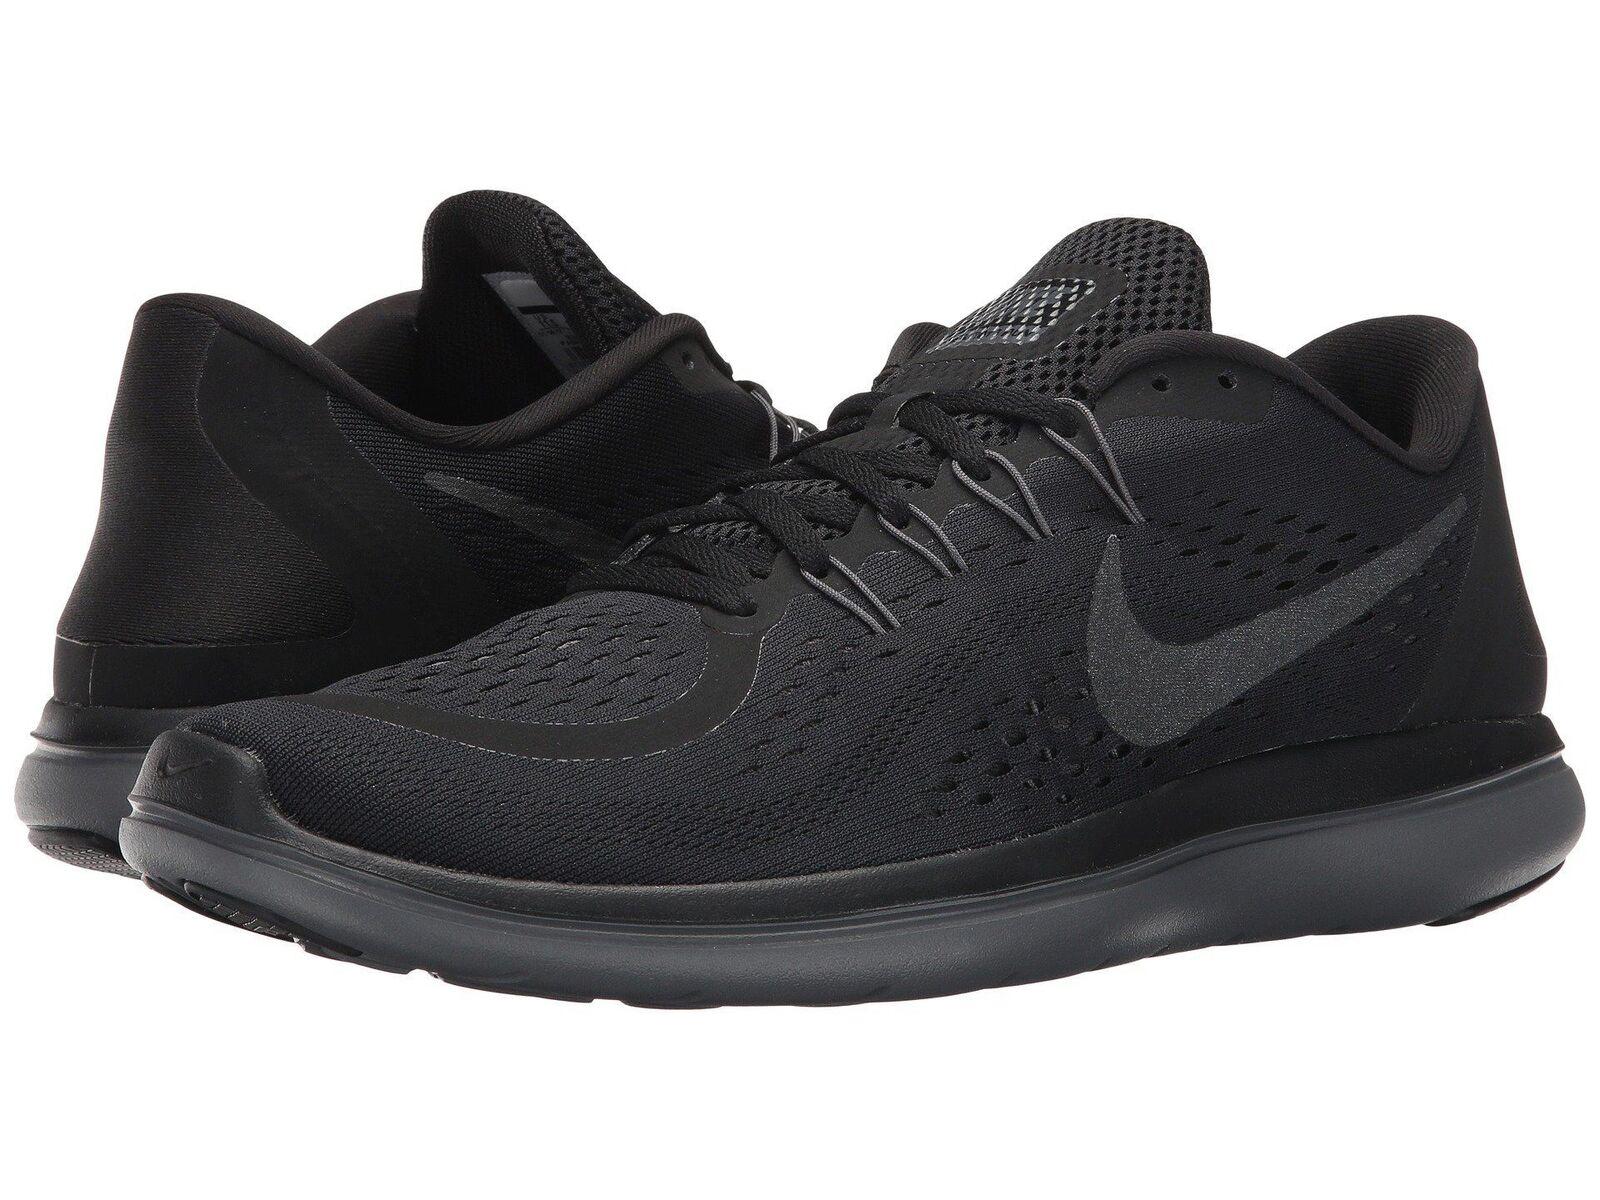 Nike Flex 2018 RN 898457005 Black Dark Gray Men's Running Shoes